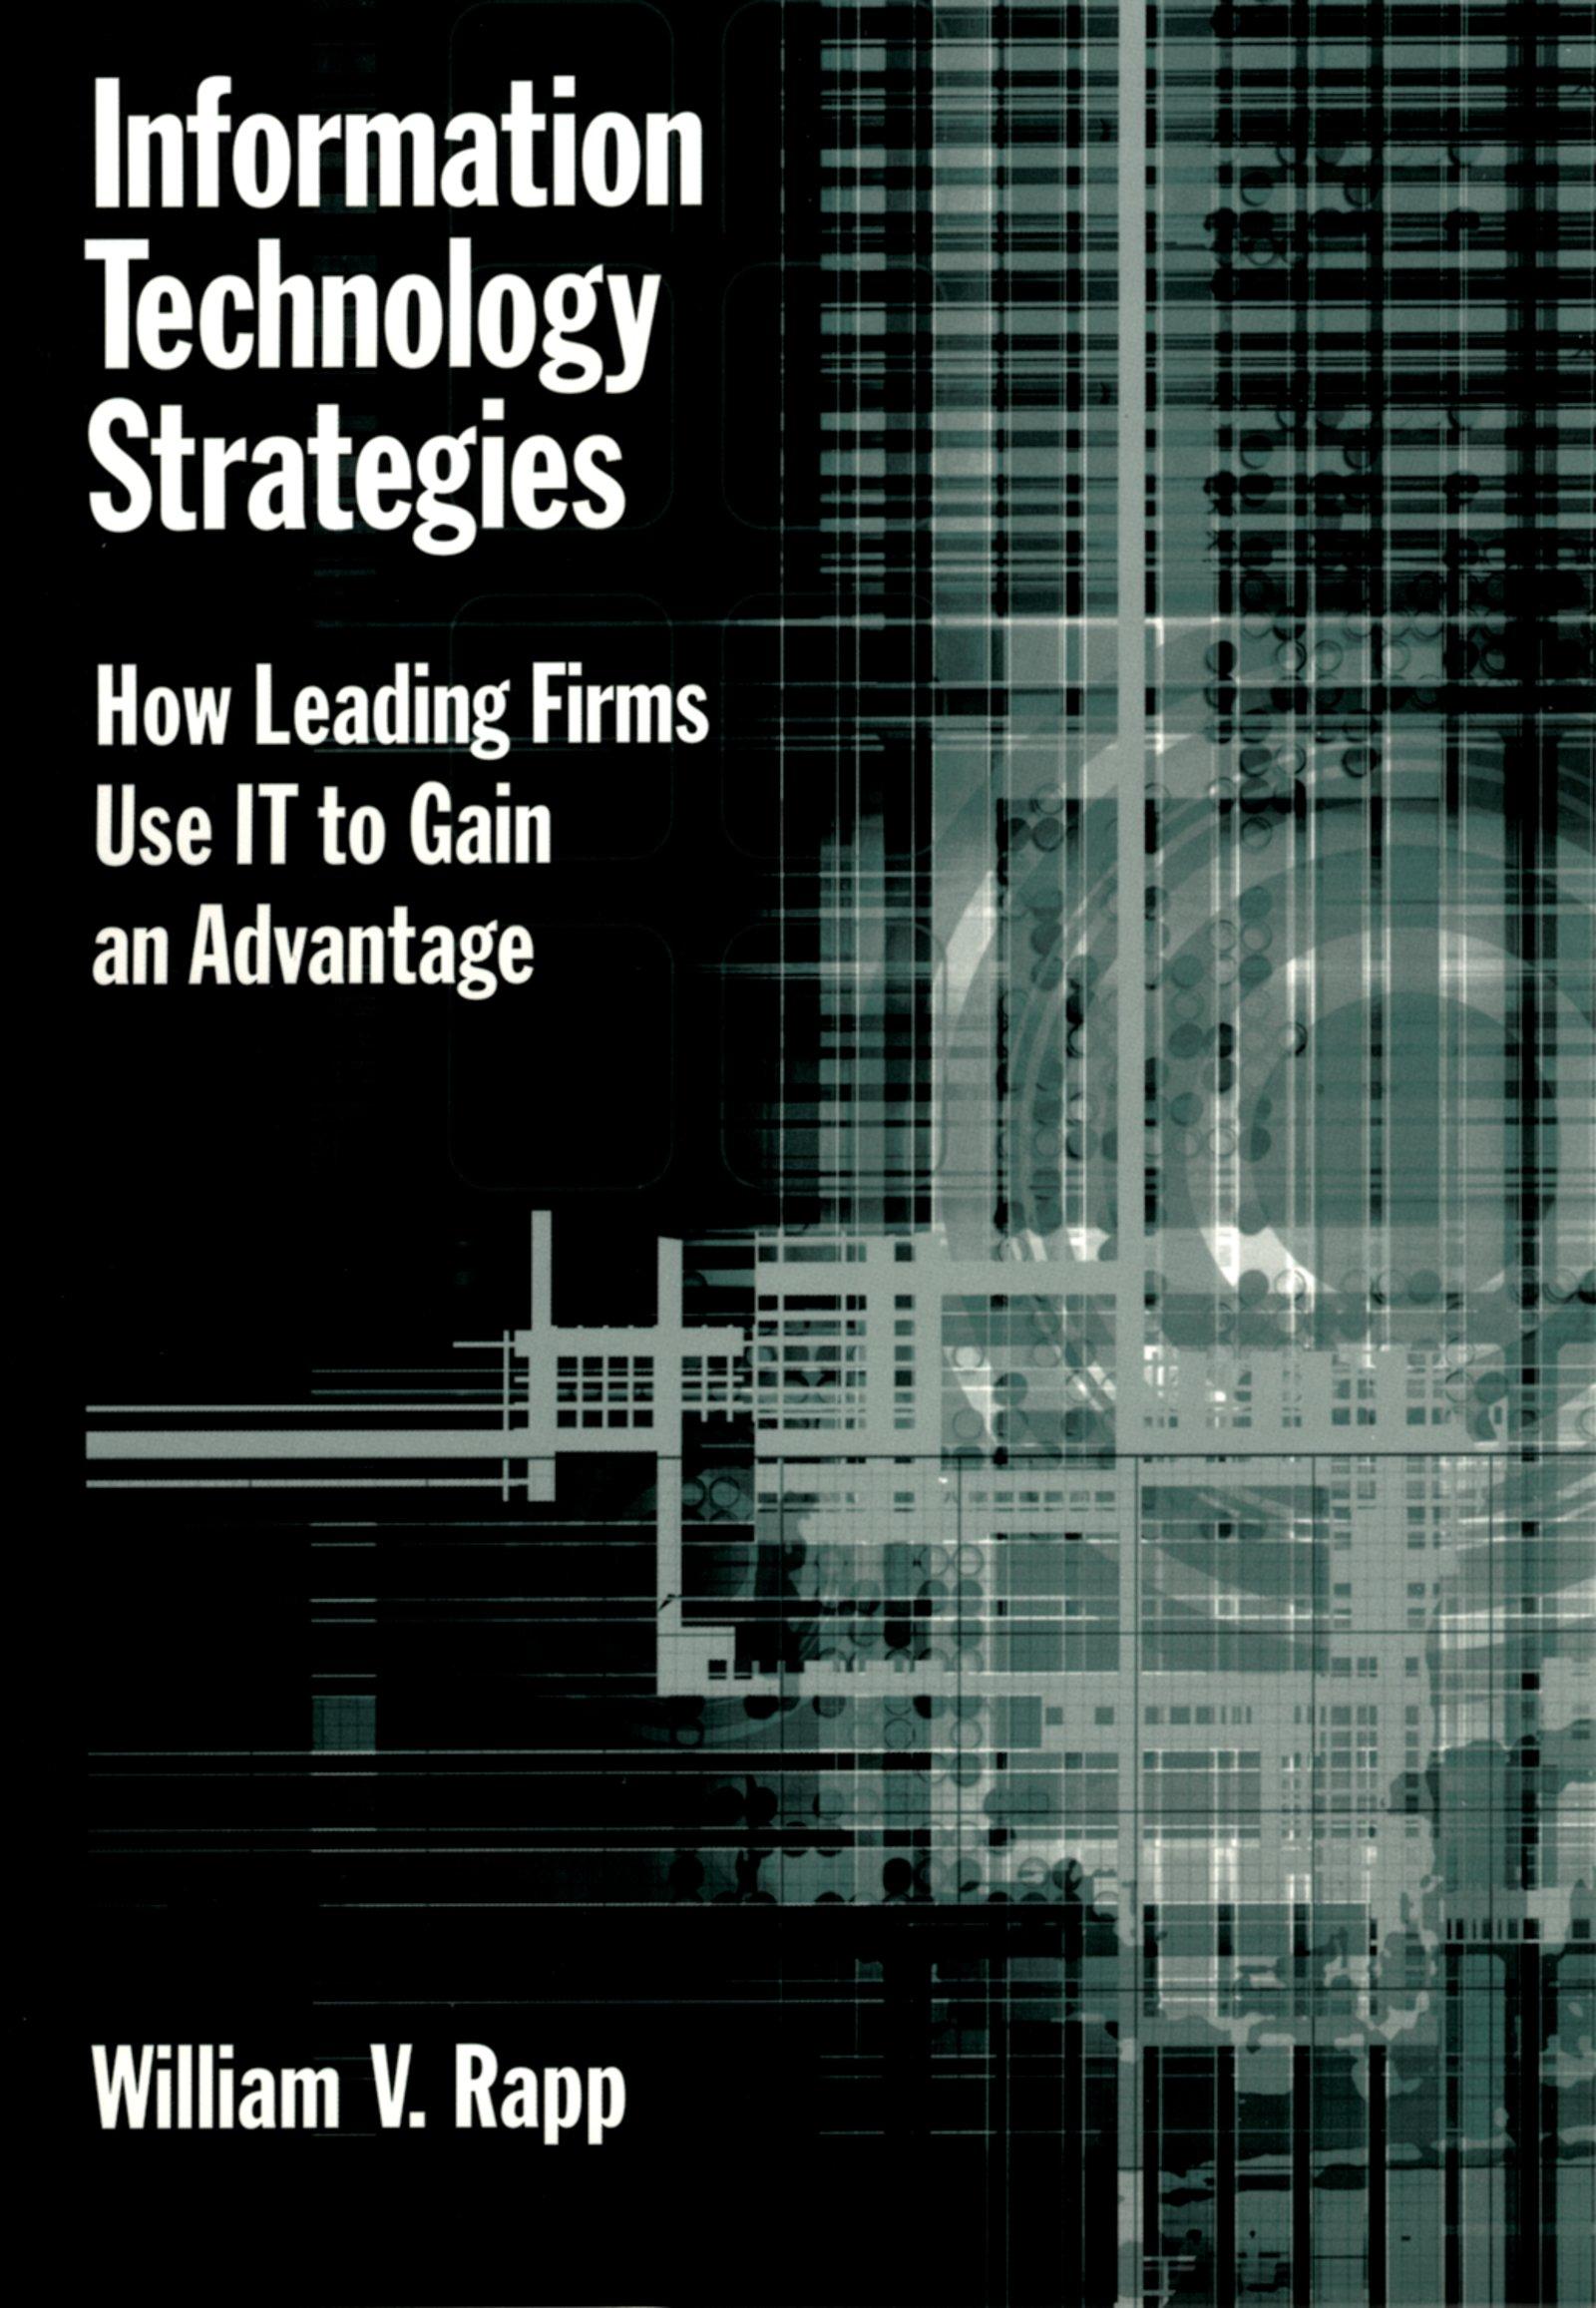 Download Ebook Information Technology Strategies by William V. Rapp Pdf